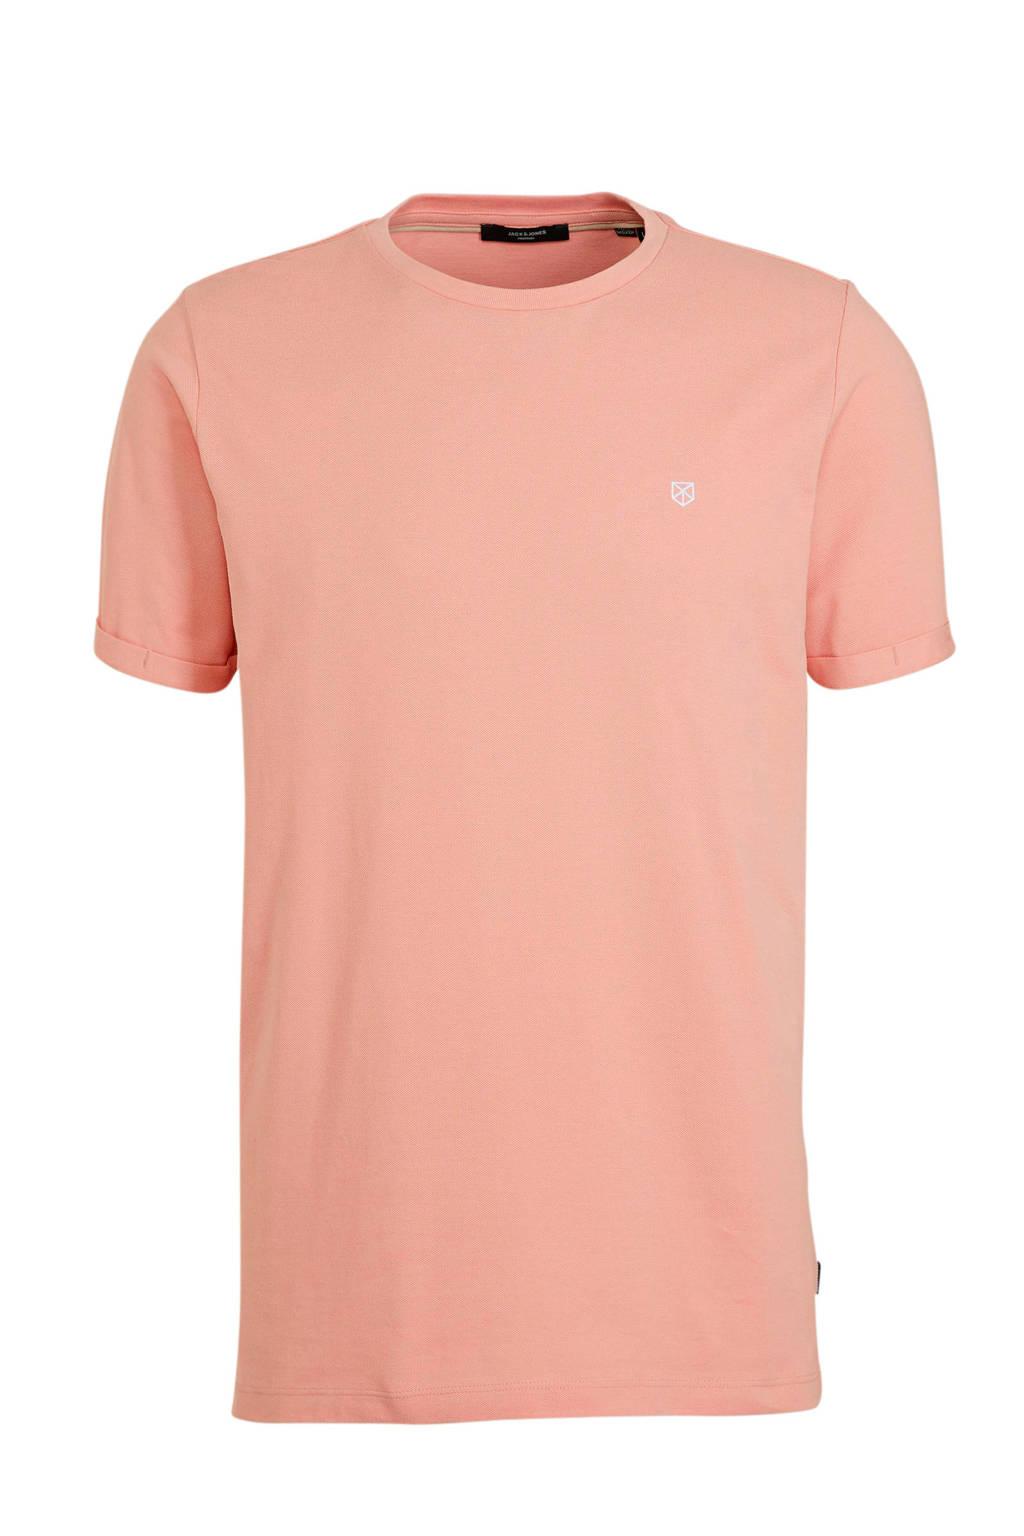 JACK & JONES PREMIUM T-shirt met logo zalm, Zalm